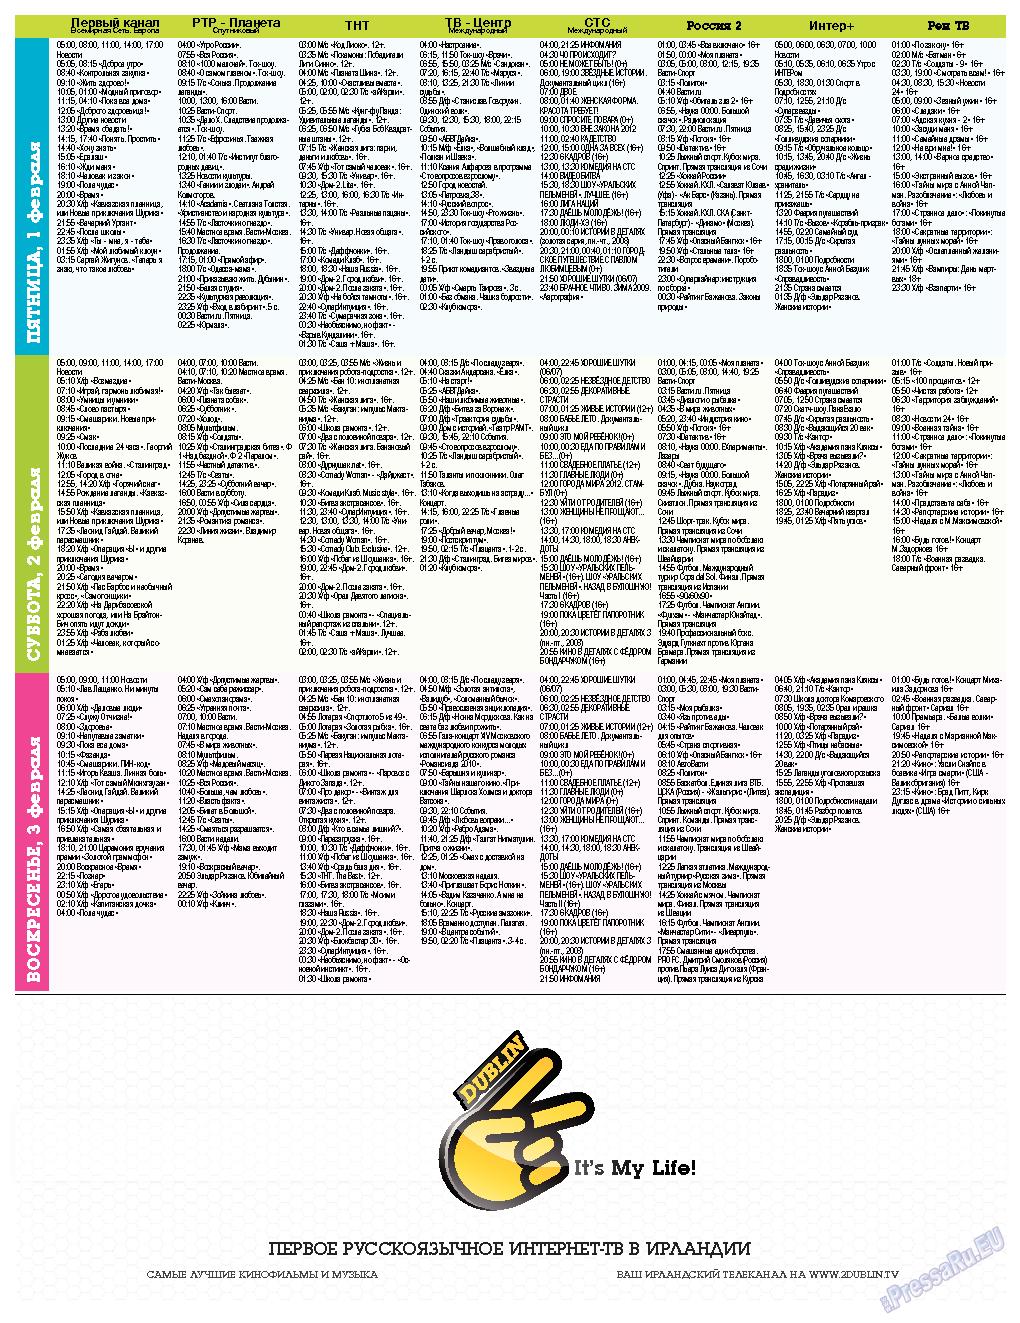 Дублин инфоцентр (газета). 2013 год, номер 3, стр. 9